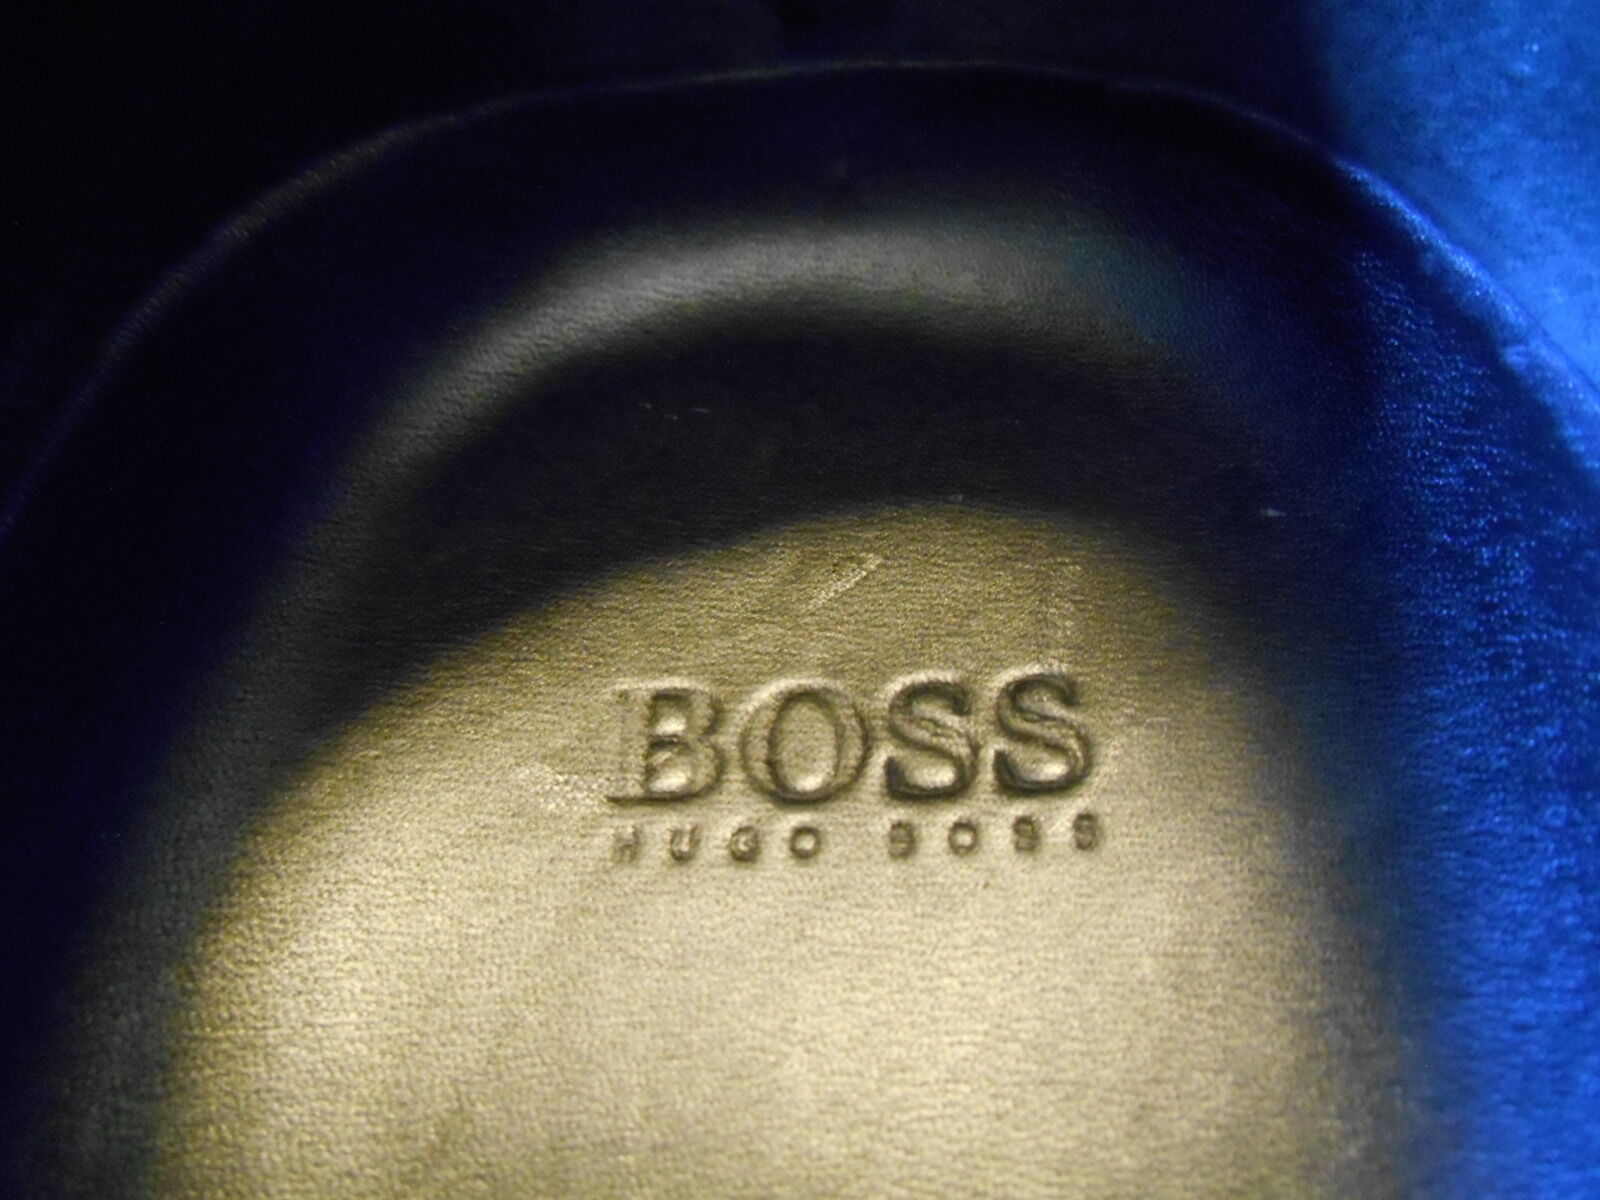 HUGO HUGO HUGO BOSS LOAFER schwarz schuhe Größe 10 GENTLY WORN . VERY NICE. a1a003